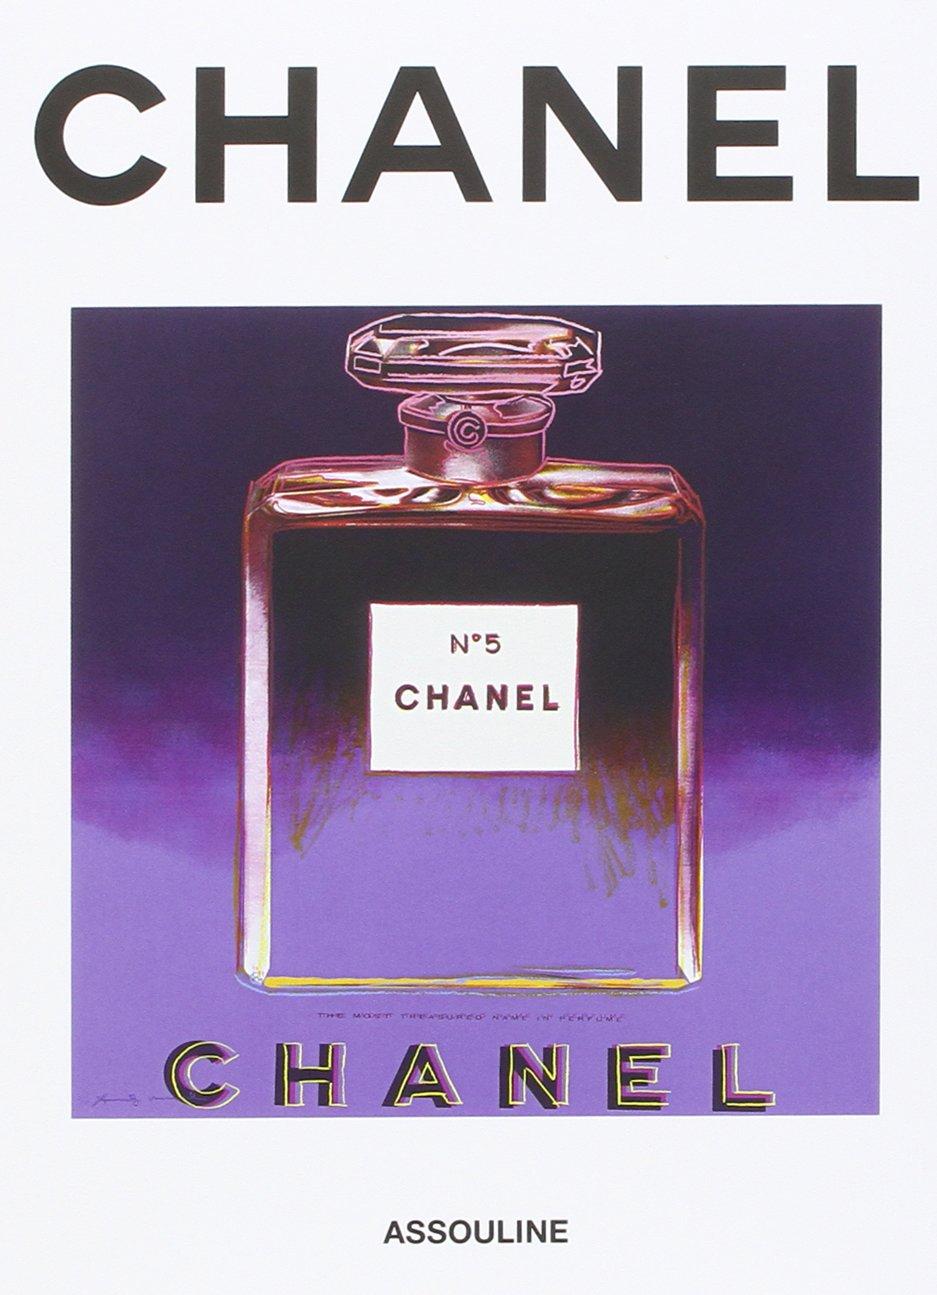 Chanel: Fashion/ Fine Jewellery/ Perfume (Set of 3 Books) (Memoire):  Francois Baudot: 9782843235184: Amazon.com: Books - Chanel: Fashion/ Fine Jewellery/ Perfume (Set Of 3 Books) (Memoire